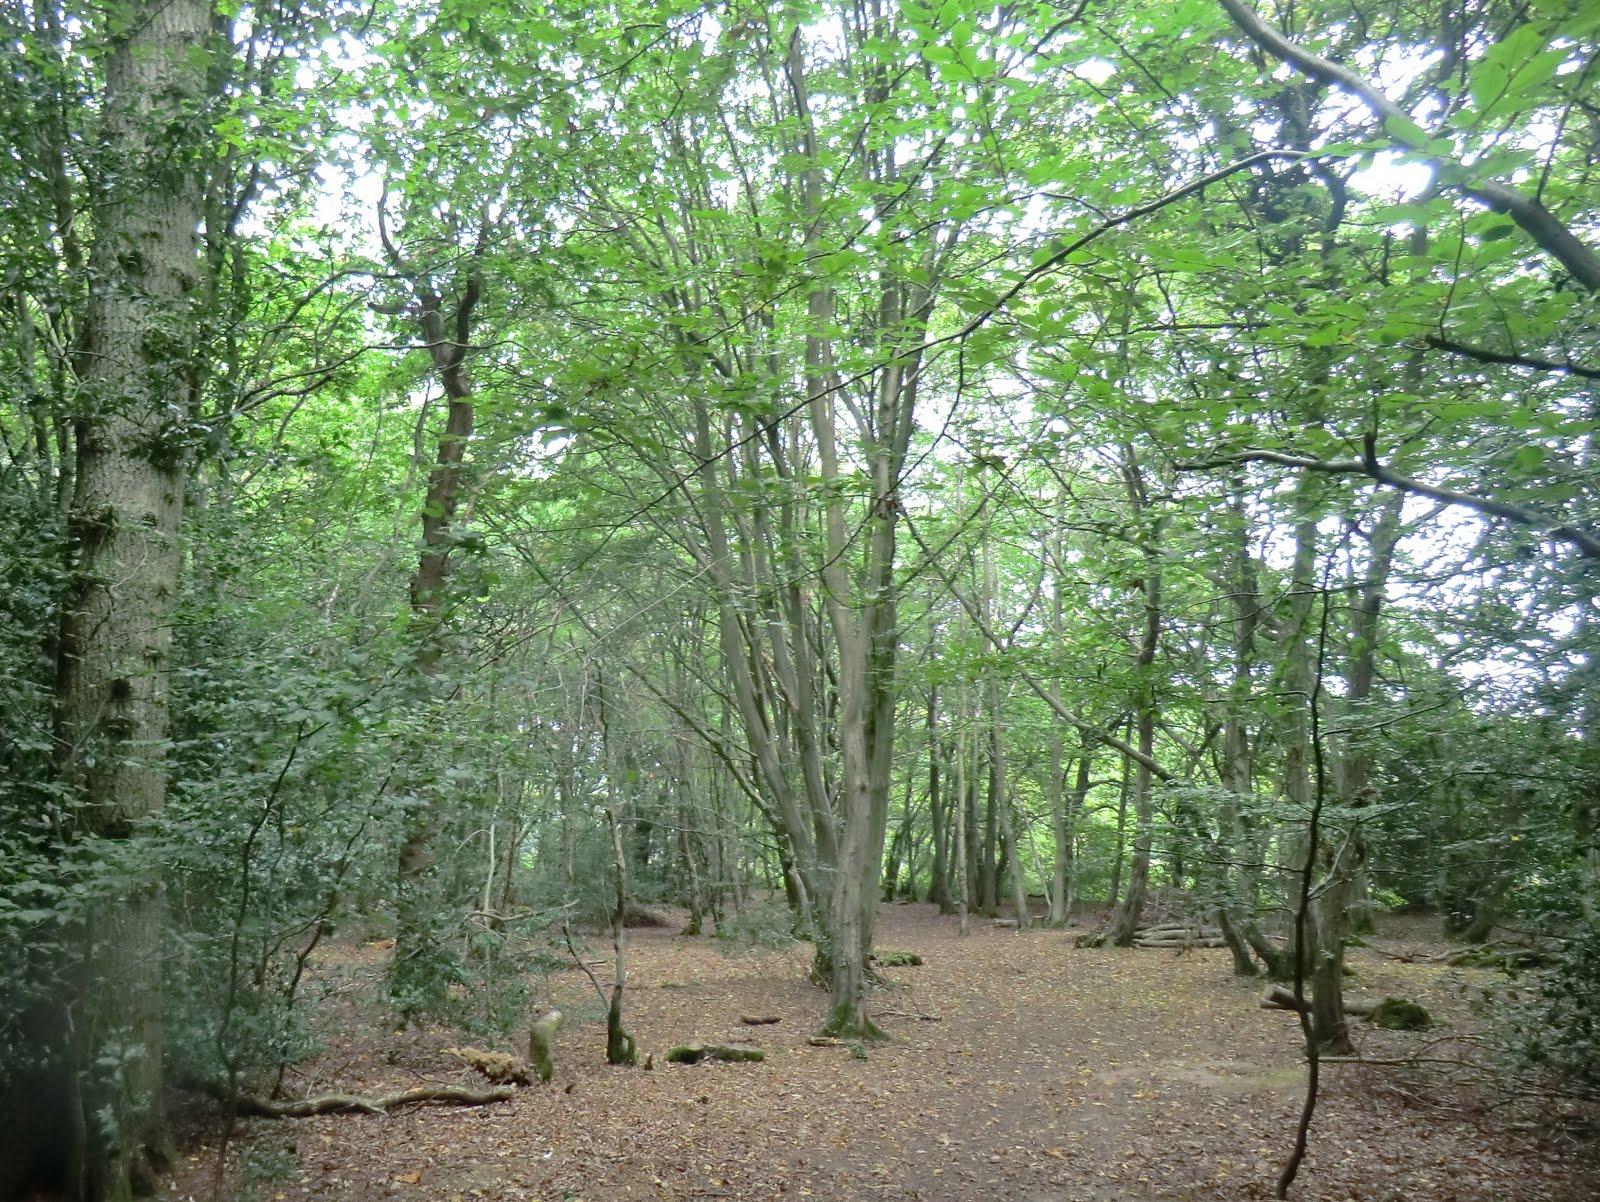 CIMG4619 Woodland path, Bedelands Farm Nature Reserve